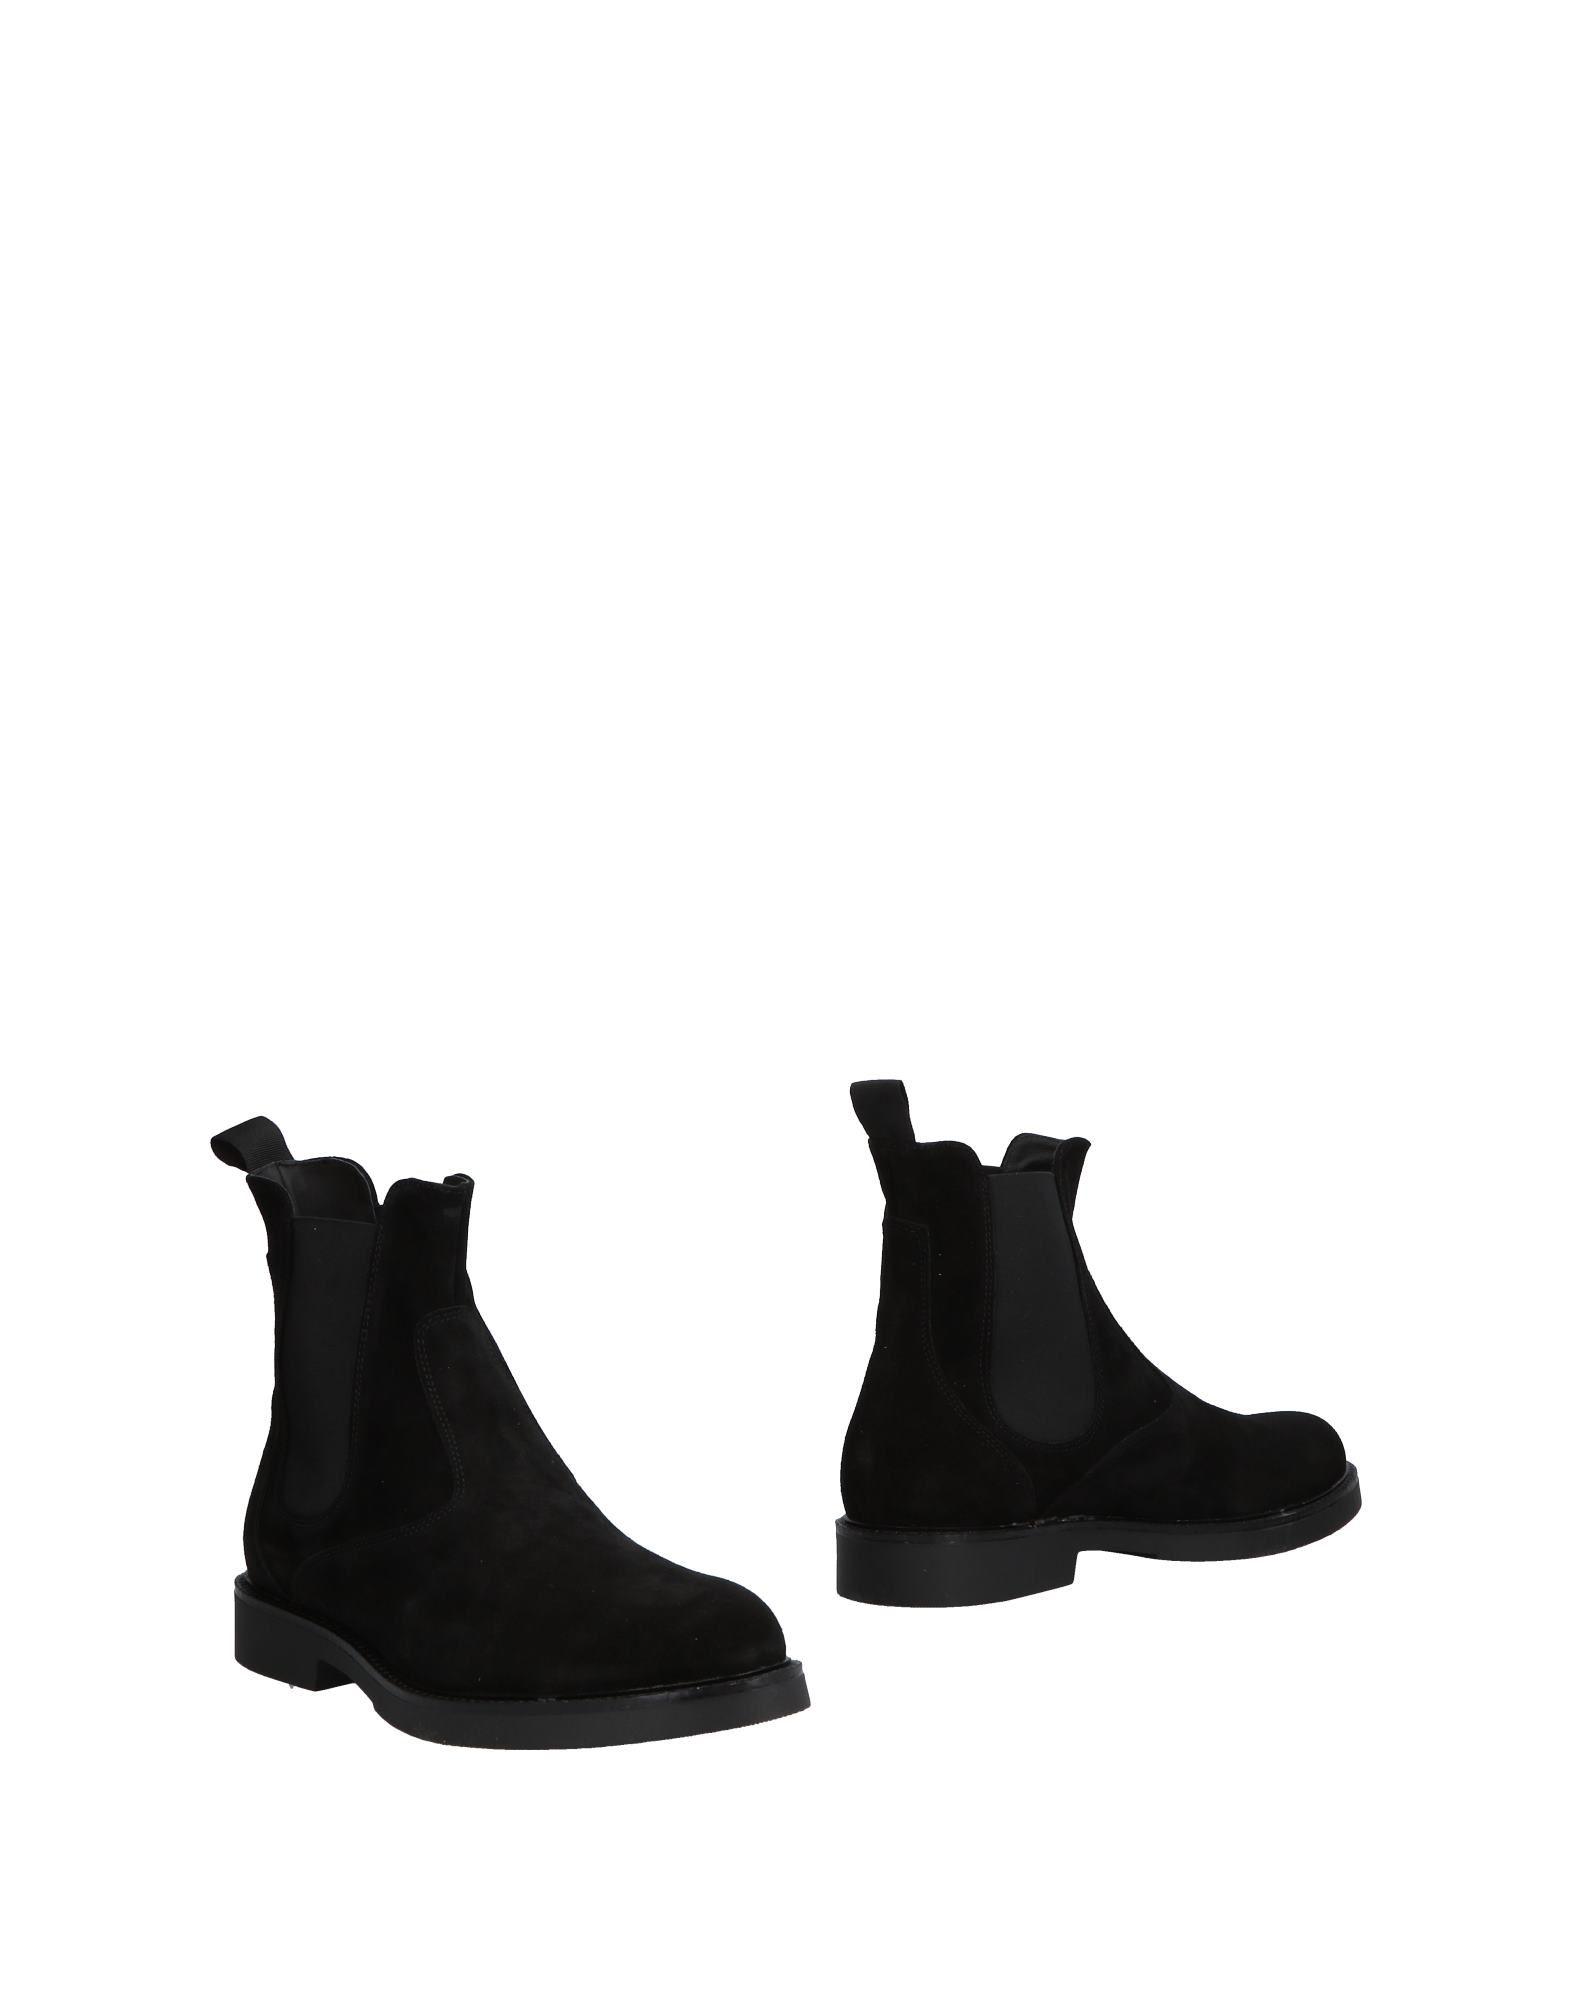 Sartoria Italiana Stiefelette Qualität Herren  11498621LB Gute Qualität Stiefelette beliebte Schuhe ae3693